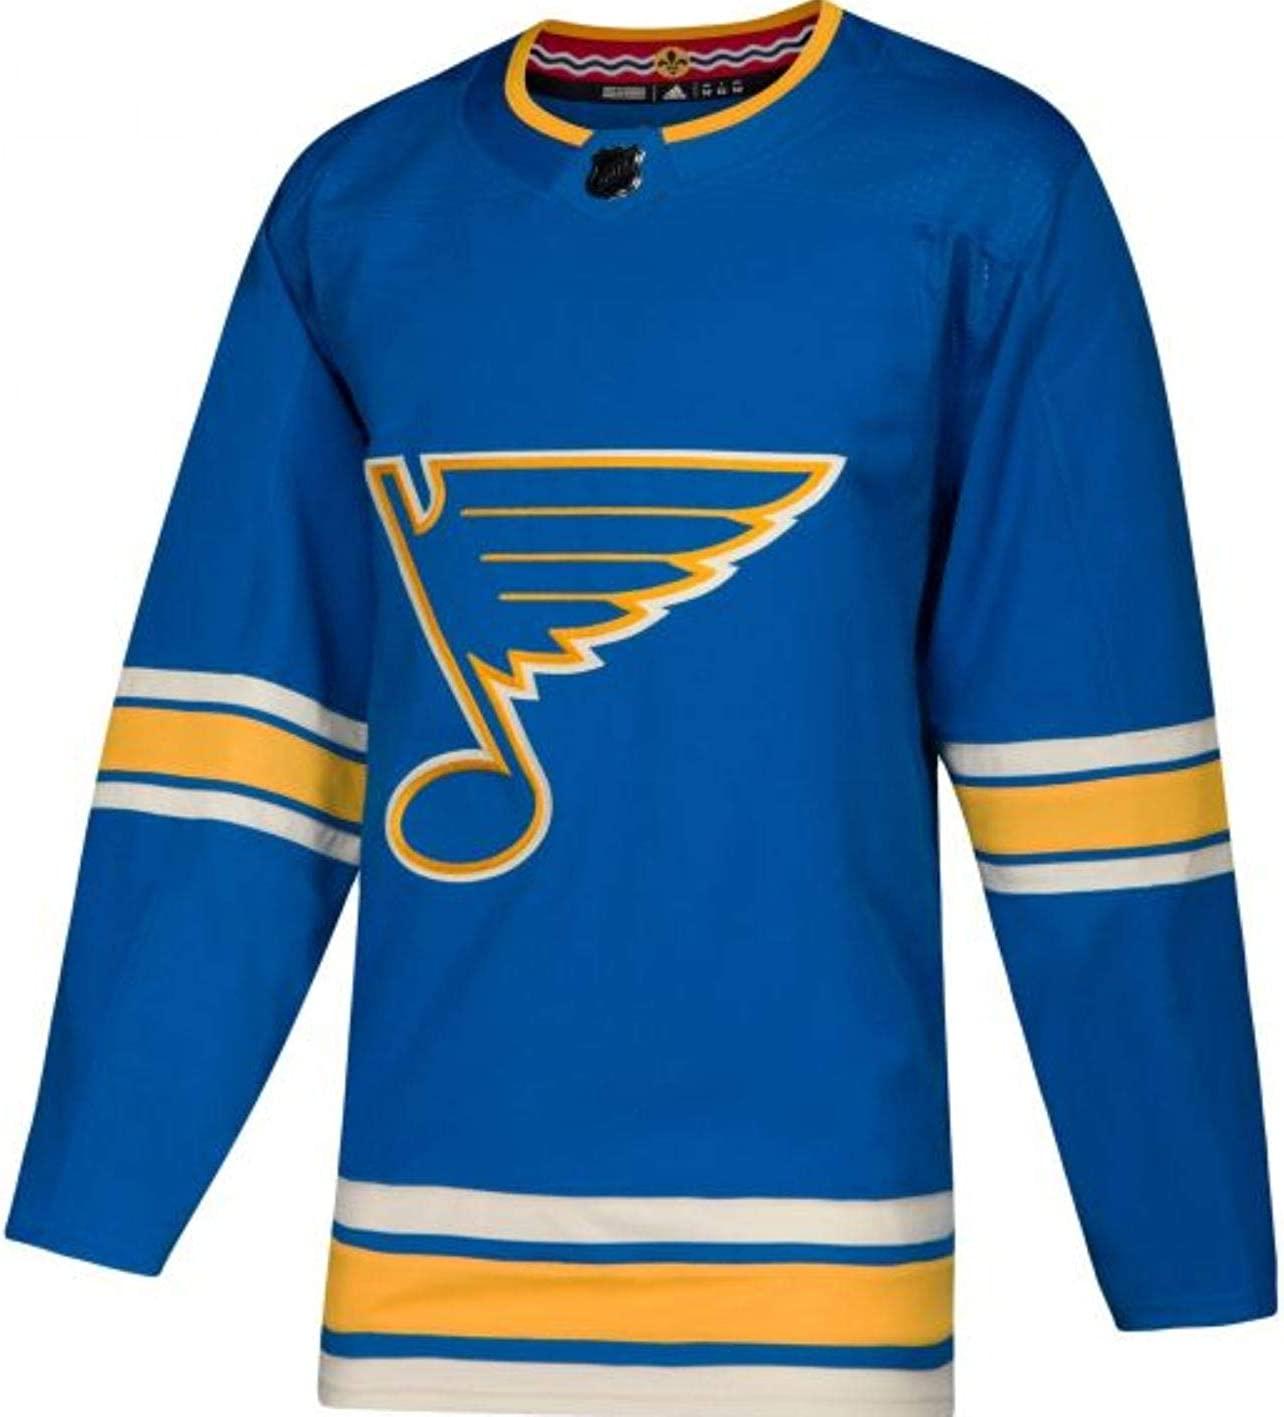 stl blues jersey